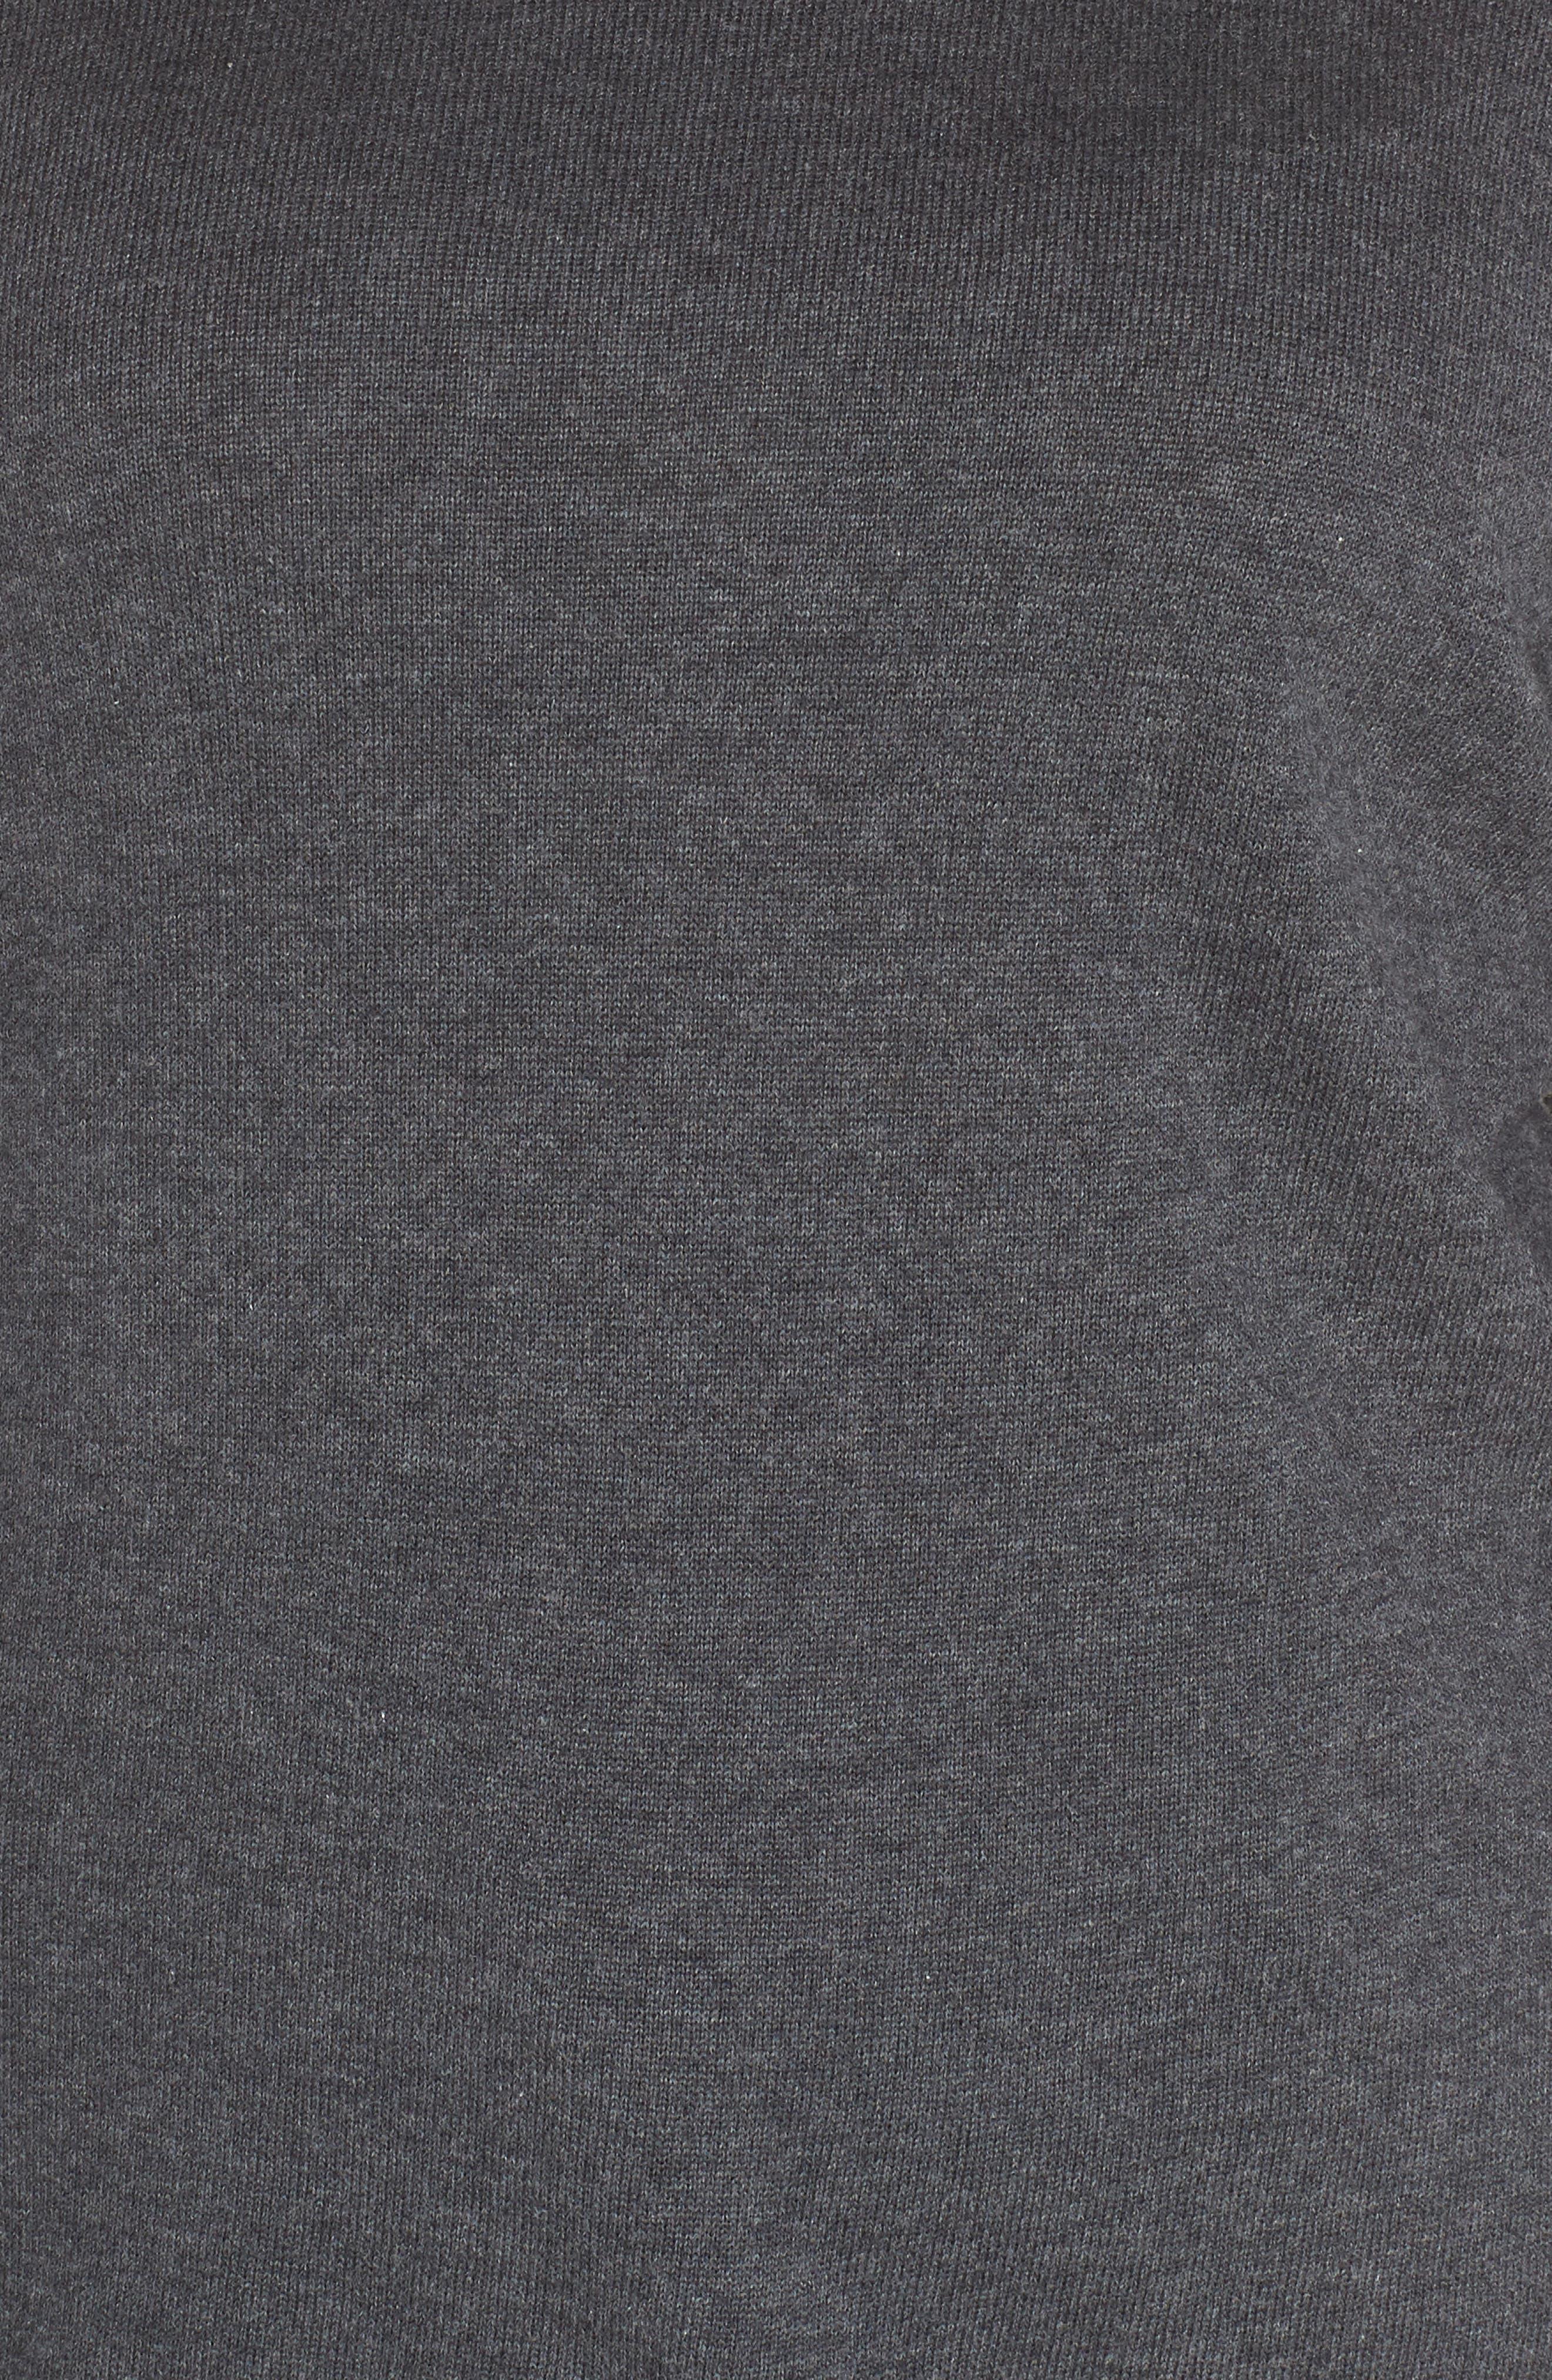 Blouson Sleeve Sweater,                             Alternate thumbnail 7, color,                             MED HEATHER GREY